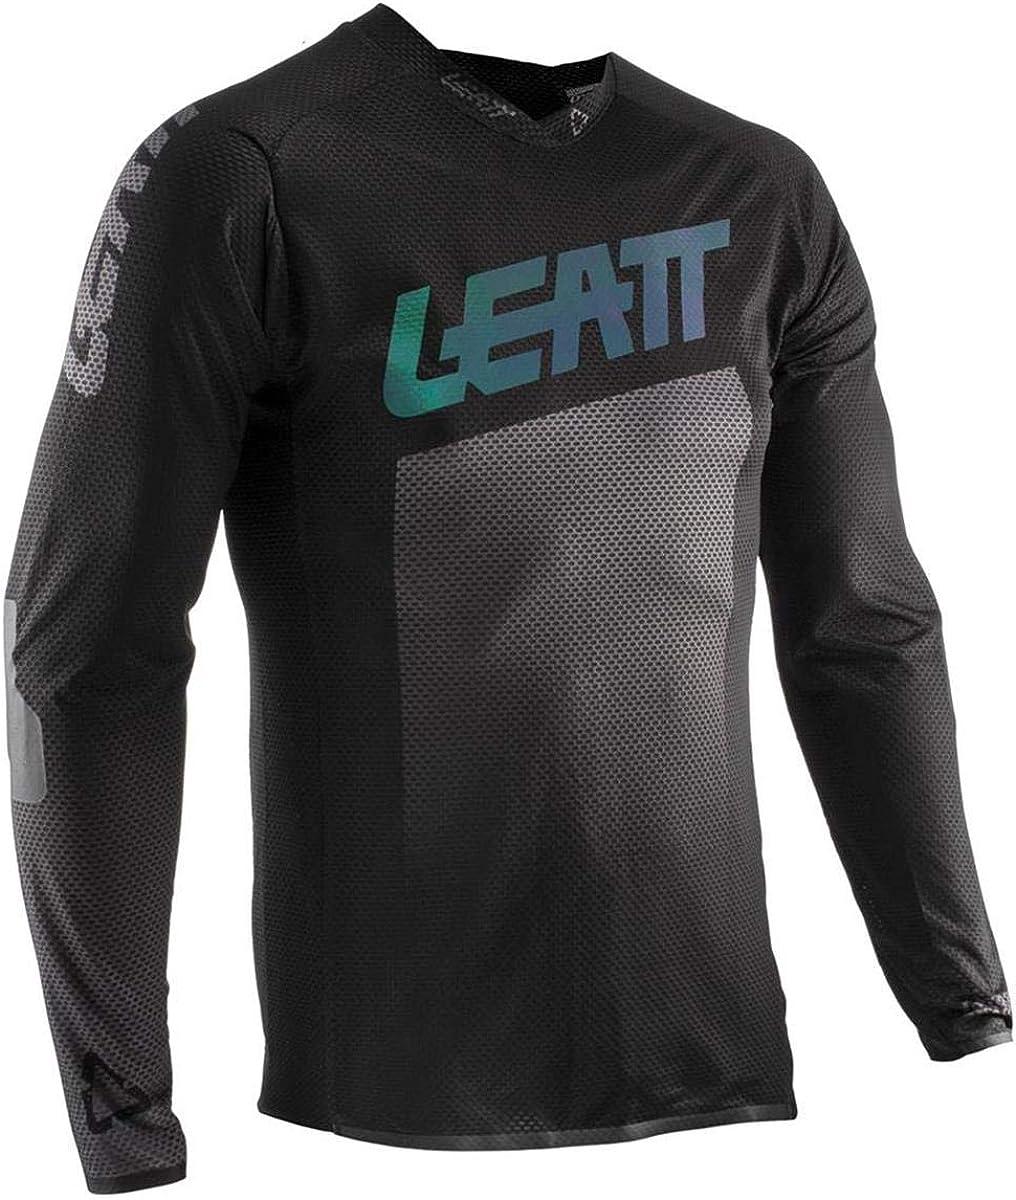 Leatt Downhill Jersey Dbx 4 0 Ultraweld Schwarz Gr Xl Bekleidung